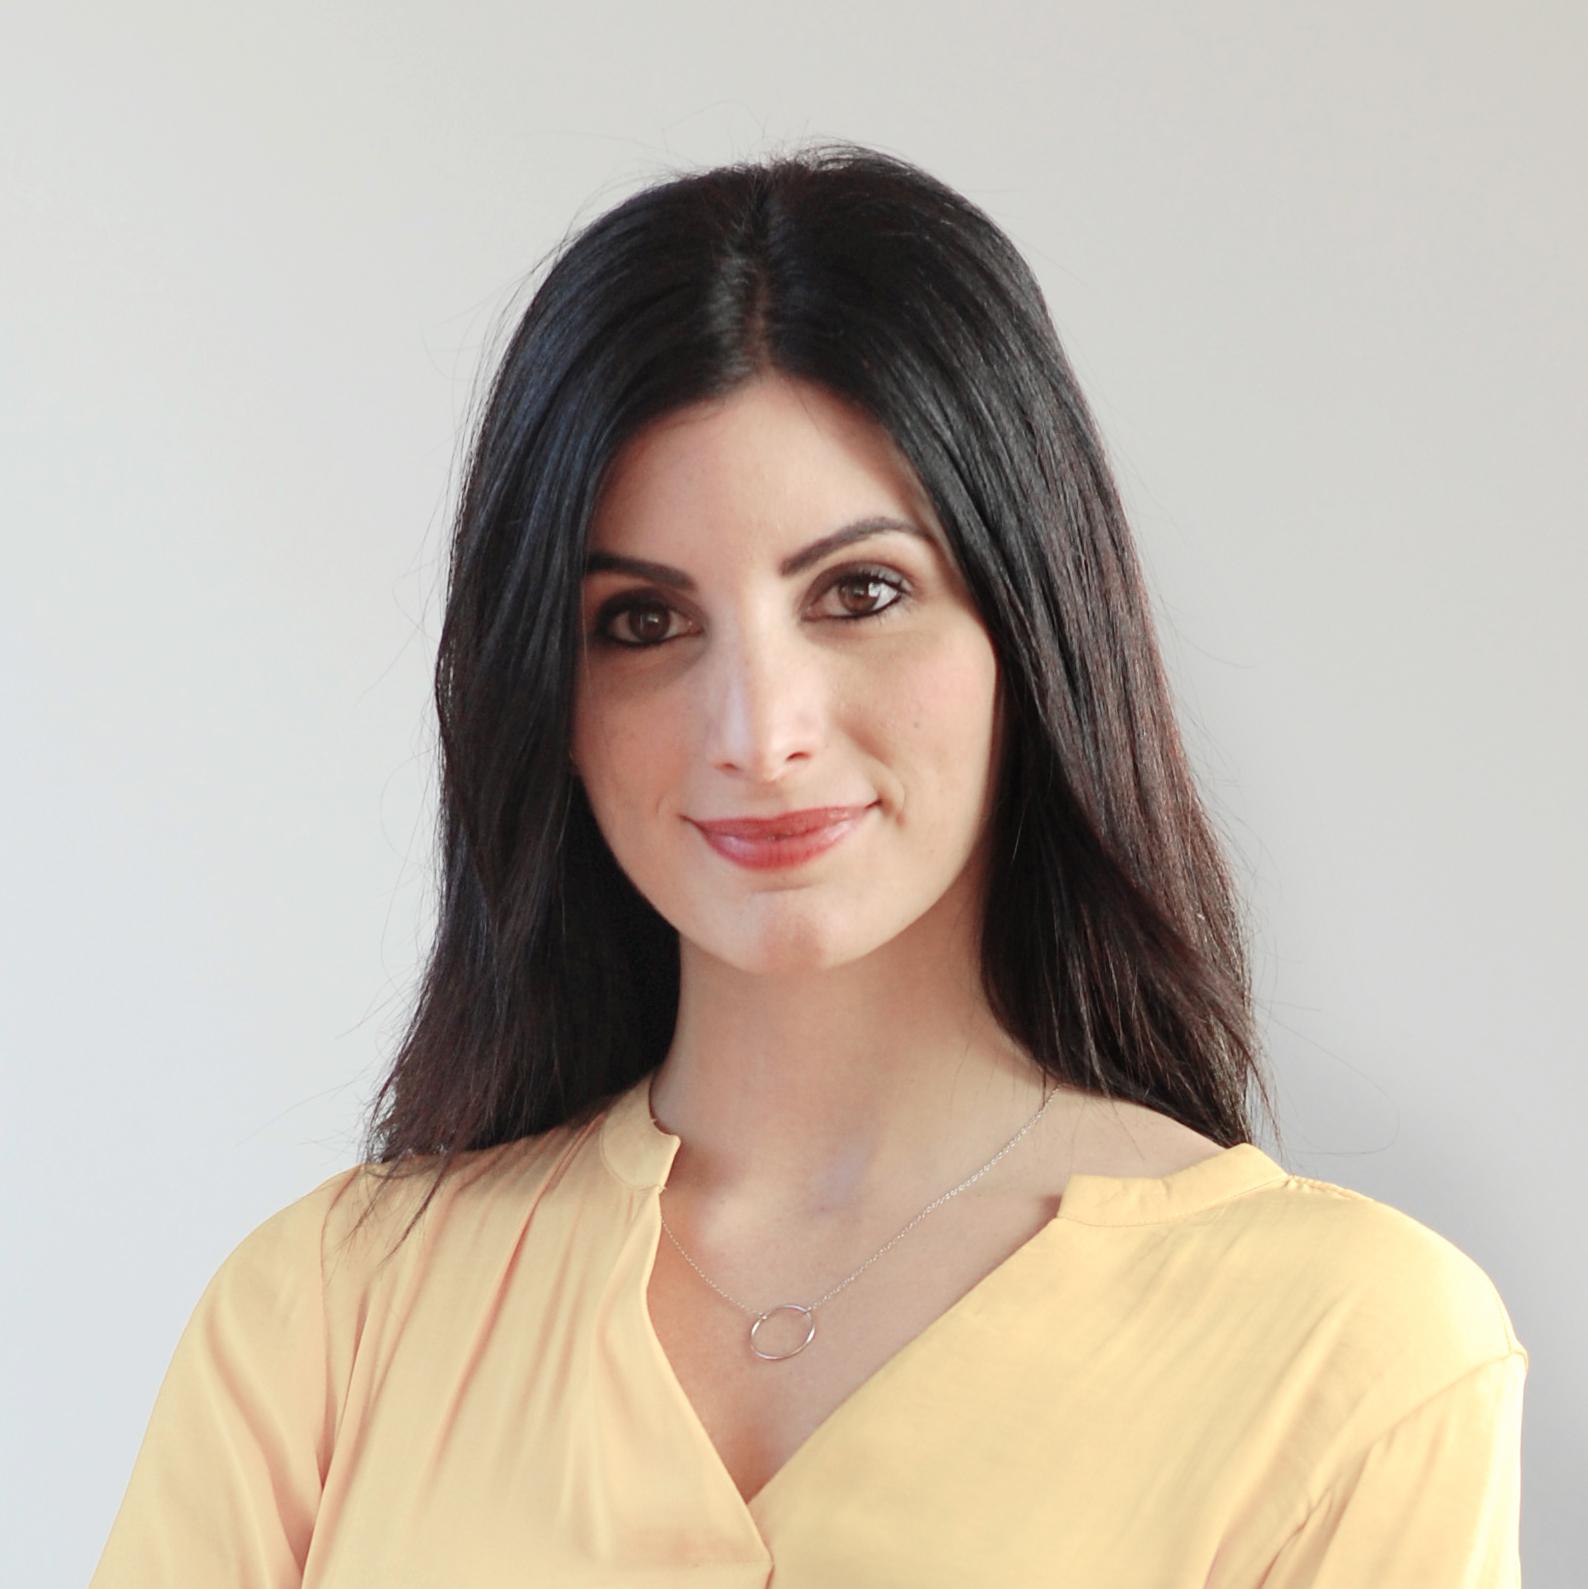 Estefanía Díaz